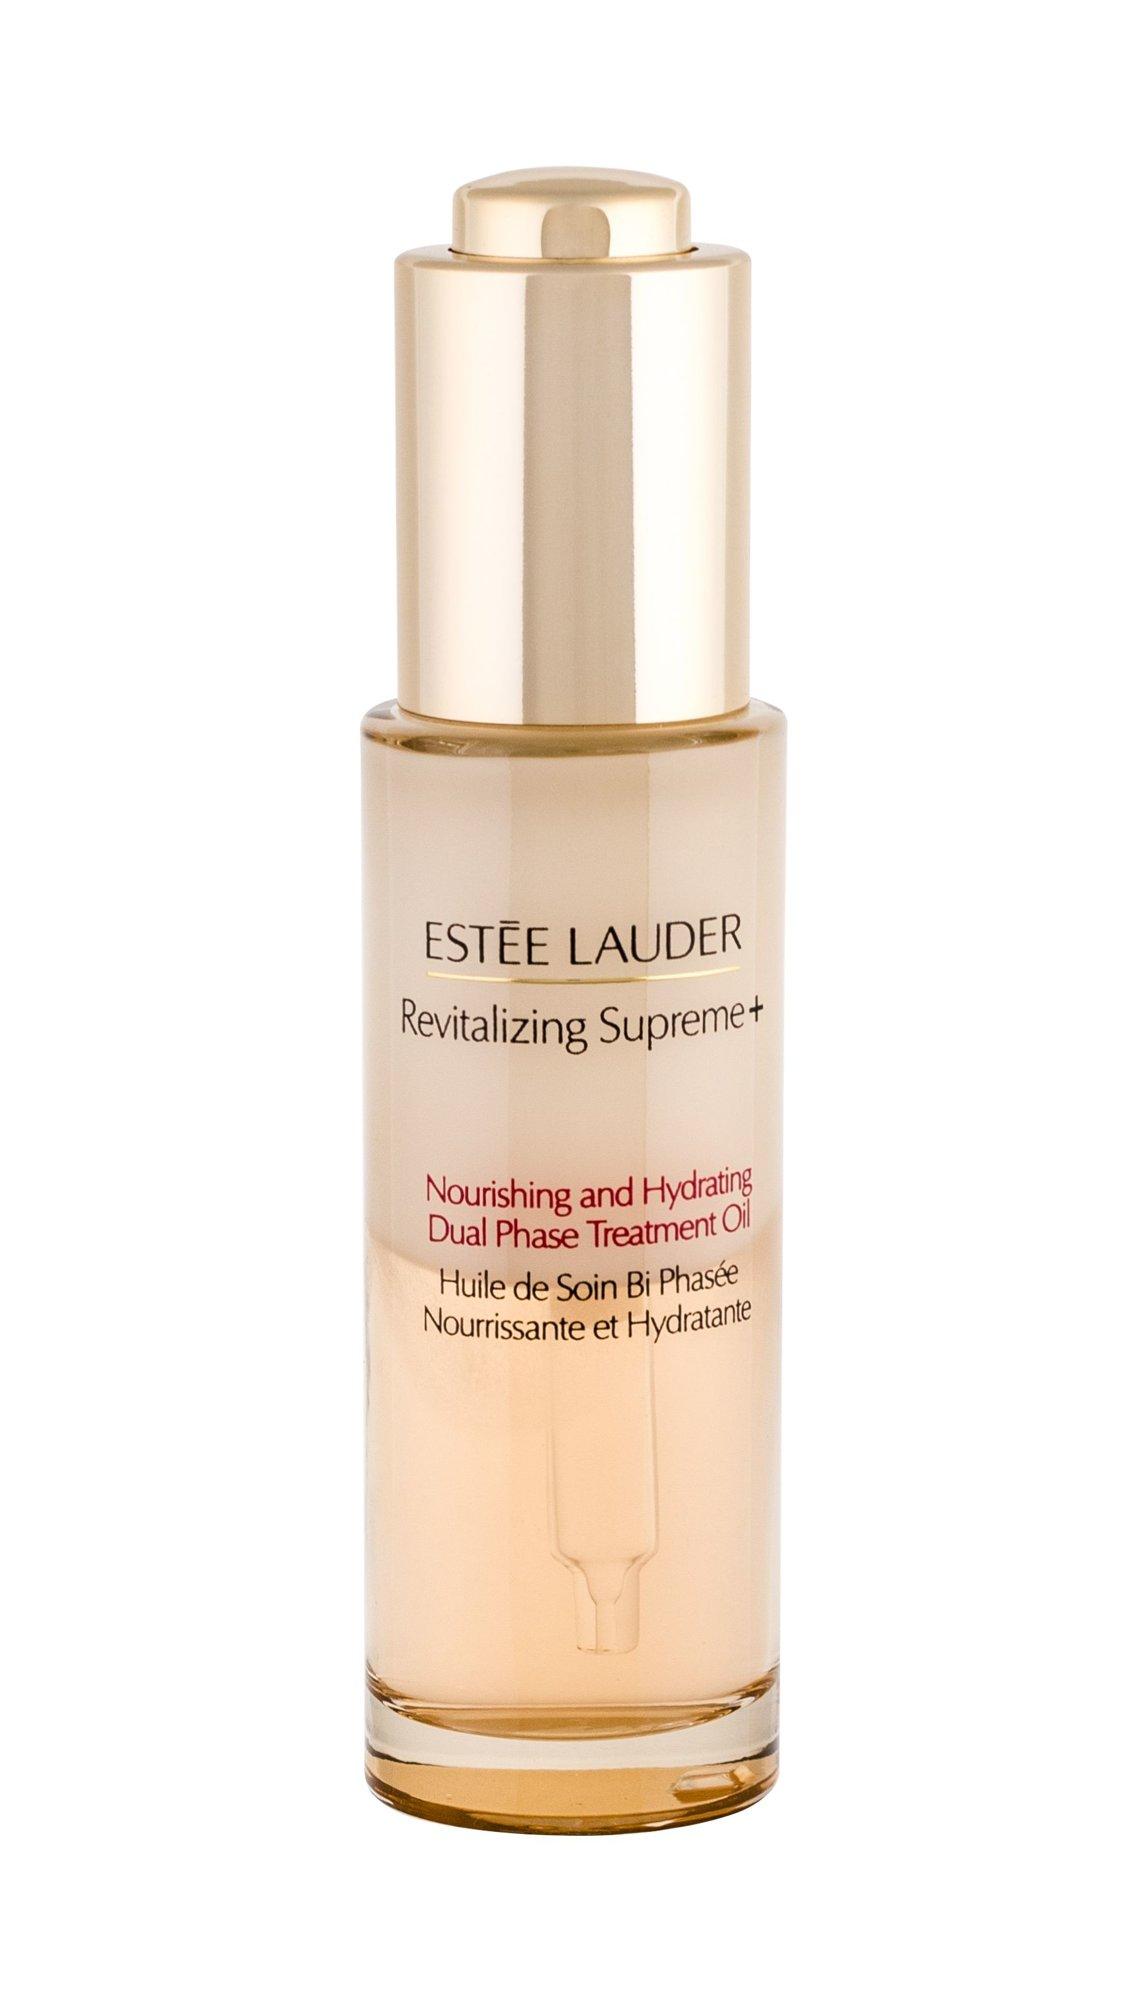 Estée Lauder Revitalizing Supreme+ Skin Serum 30ml